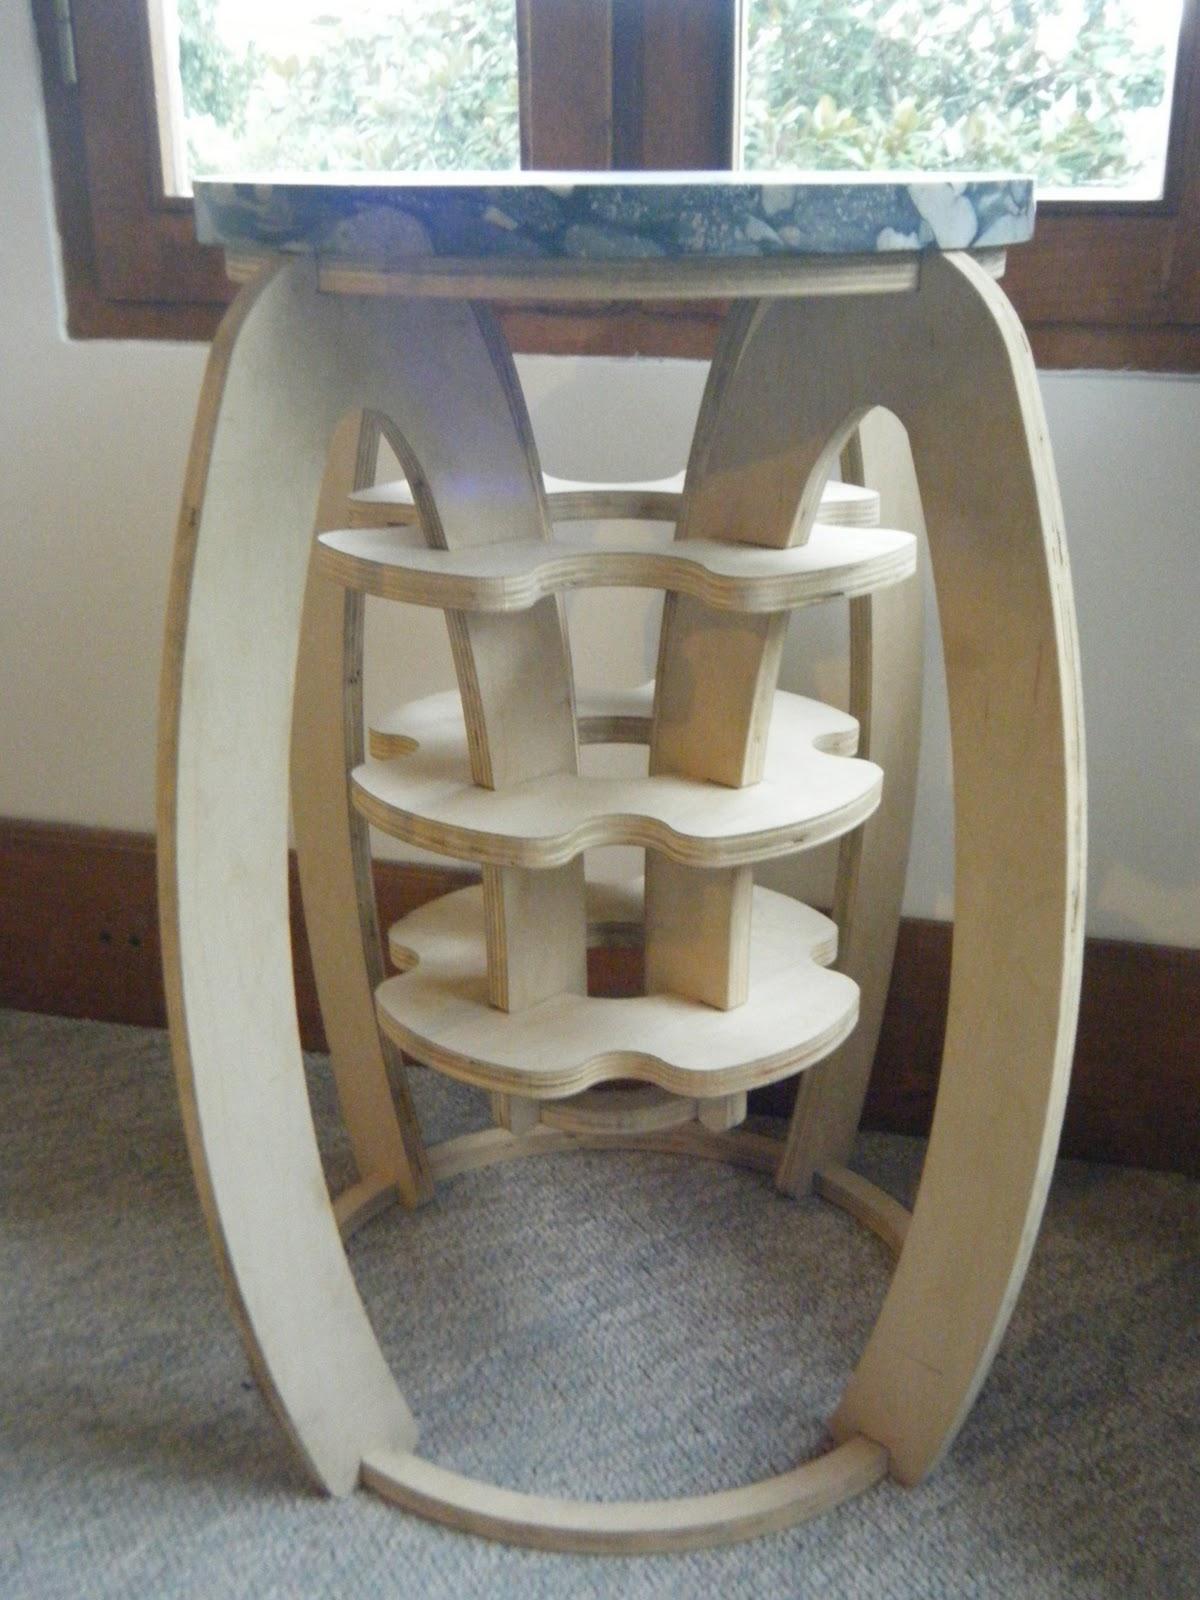 Design Flow Cnc Furniture And Sharpie Art Work